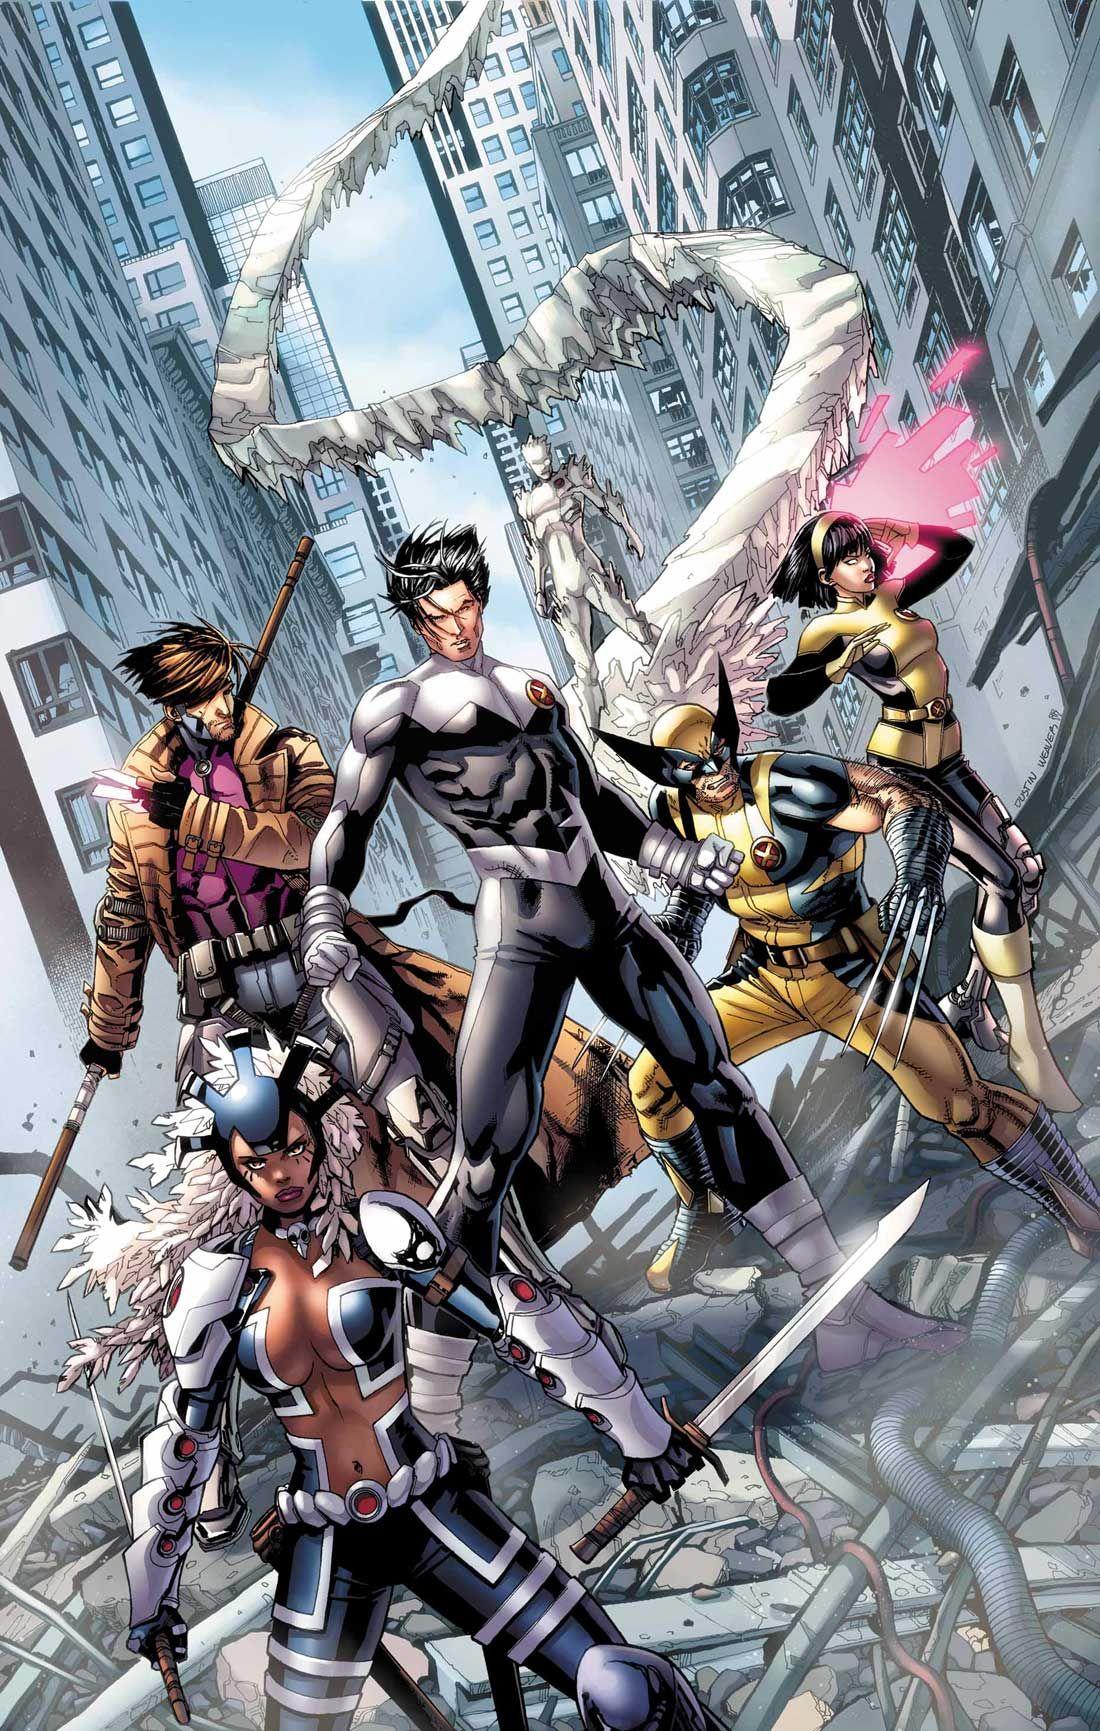 Astonishing X Men 50 Art By Mike Perkins Cover By Dustin Weaver Variant Cover By John Cassaday Comics X Men Marvel Comics Art